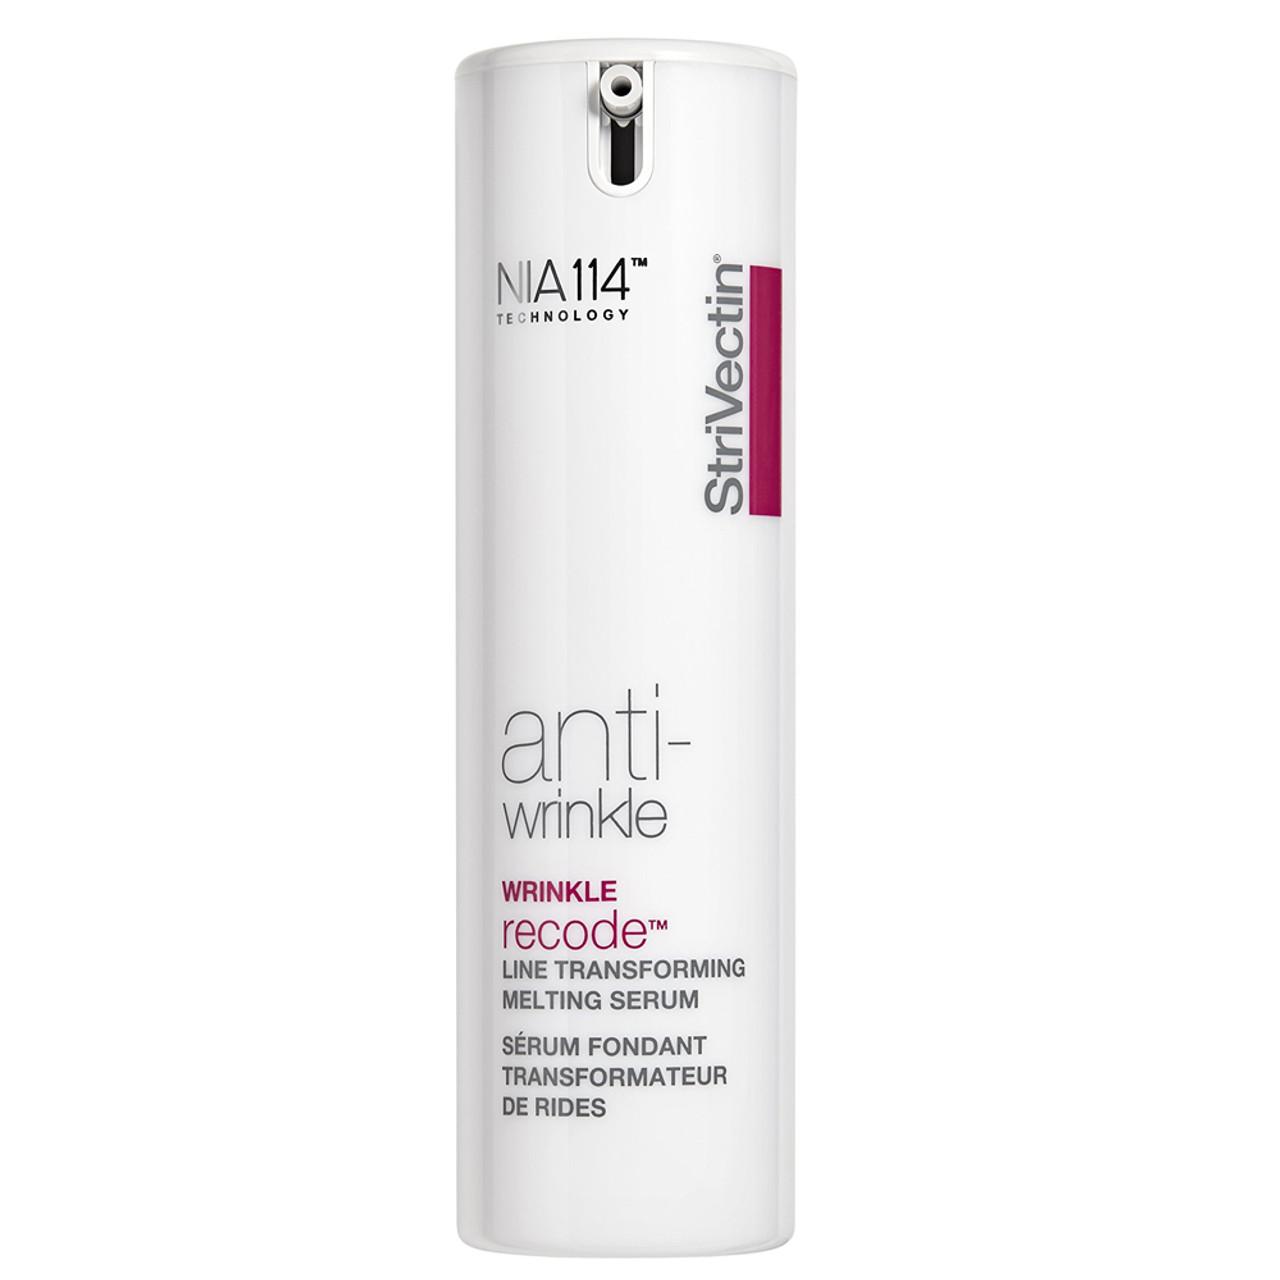 StriVectin Wrinkle Recode Line Transforming Melting Serum BeautifiedYou.com